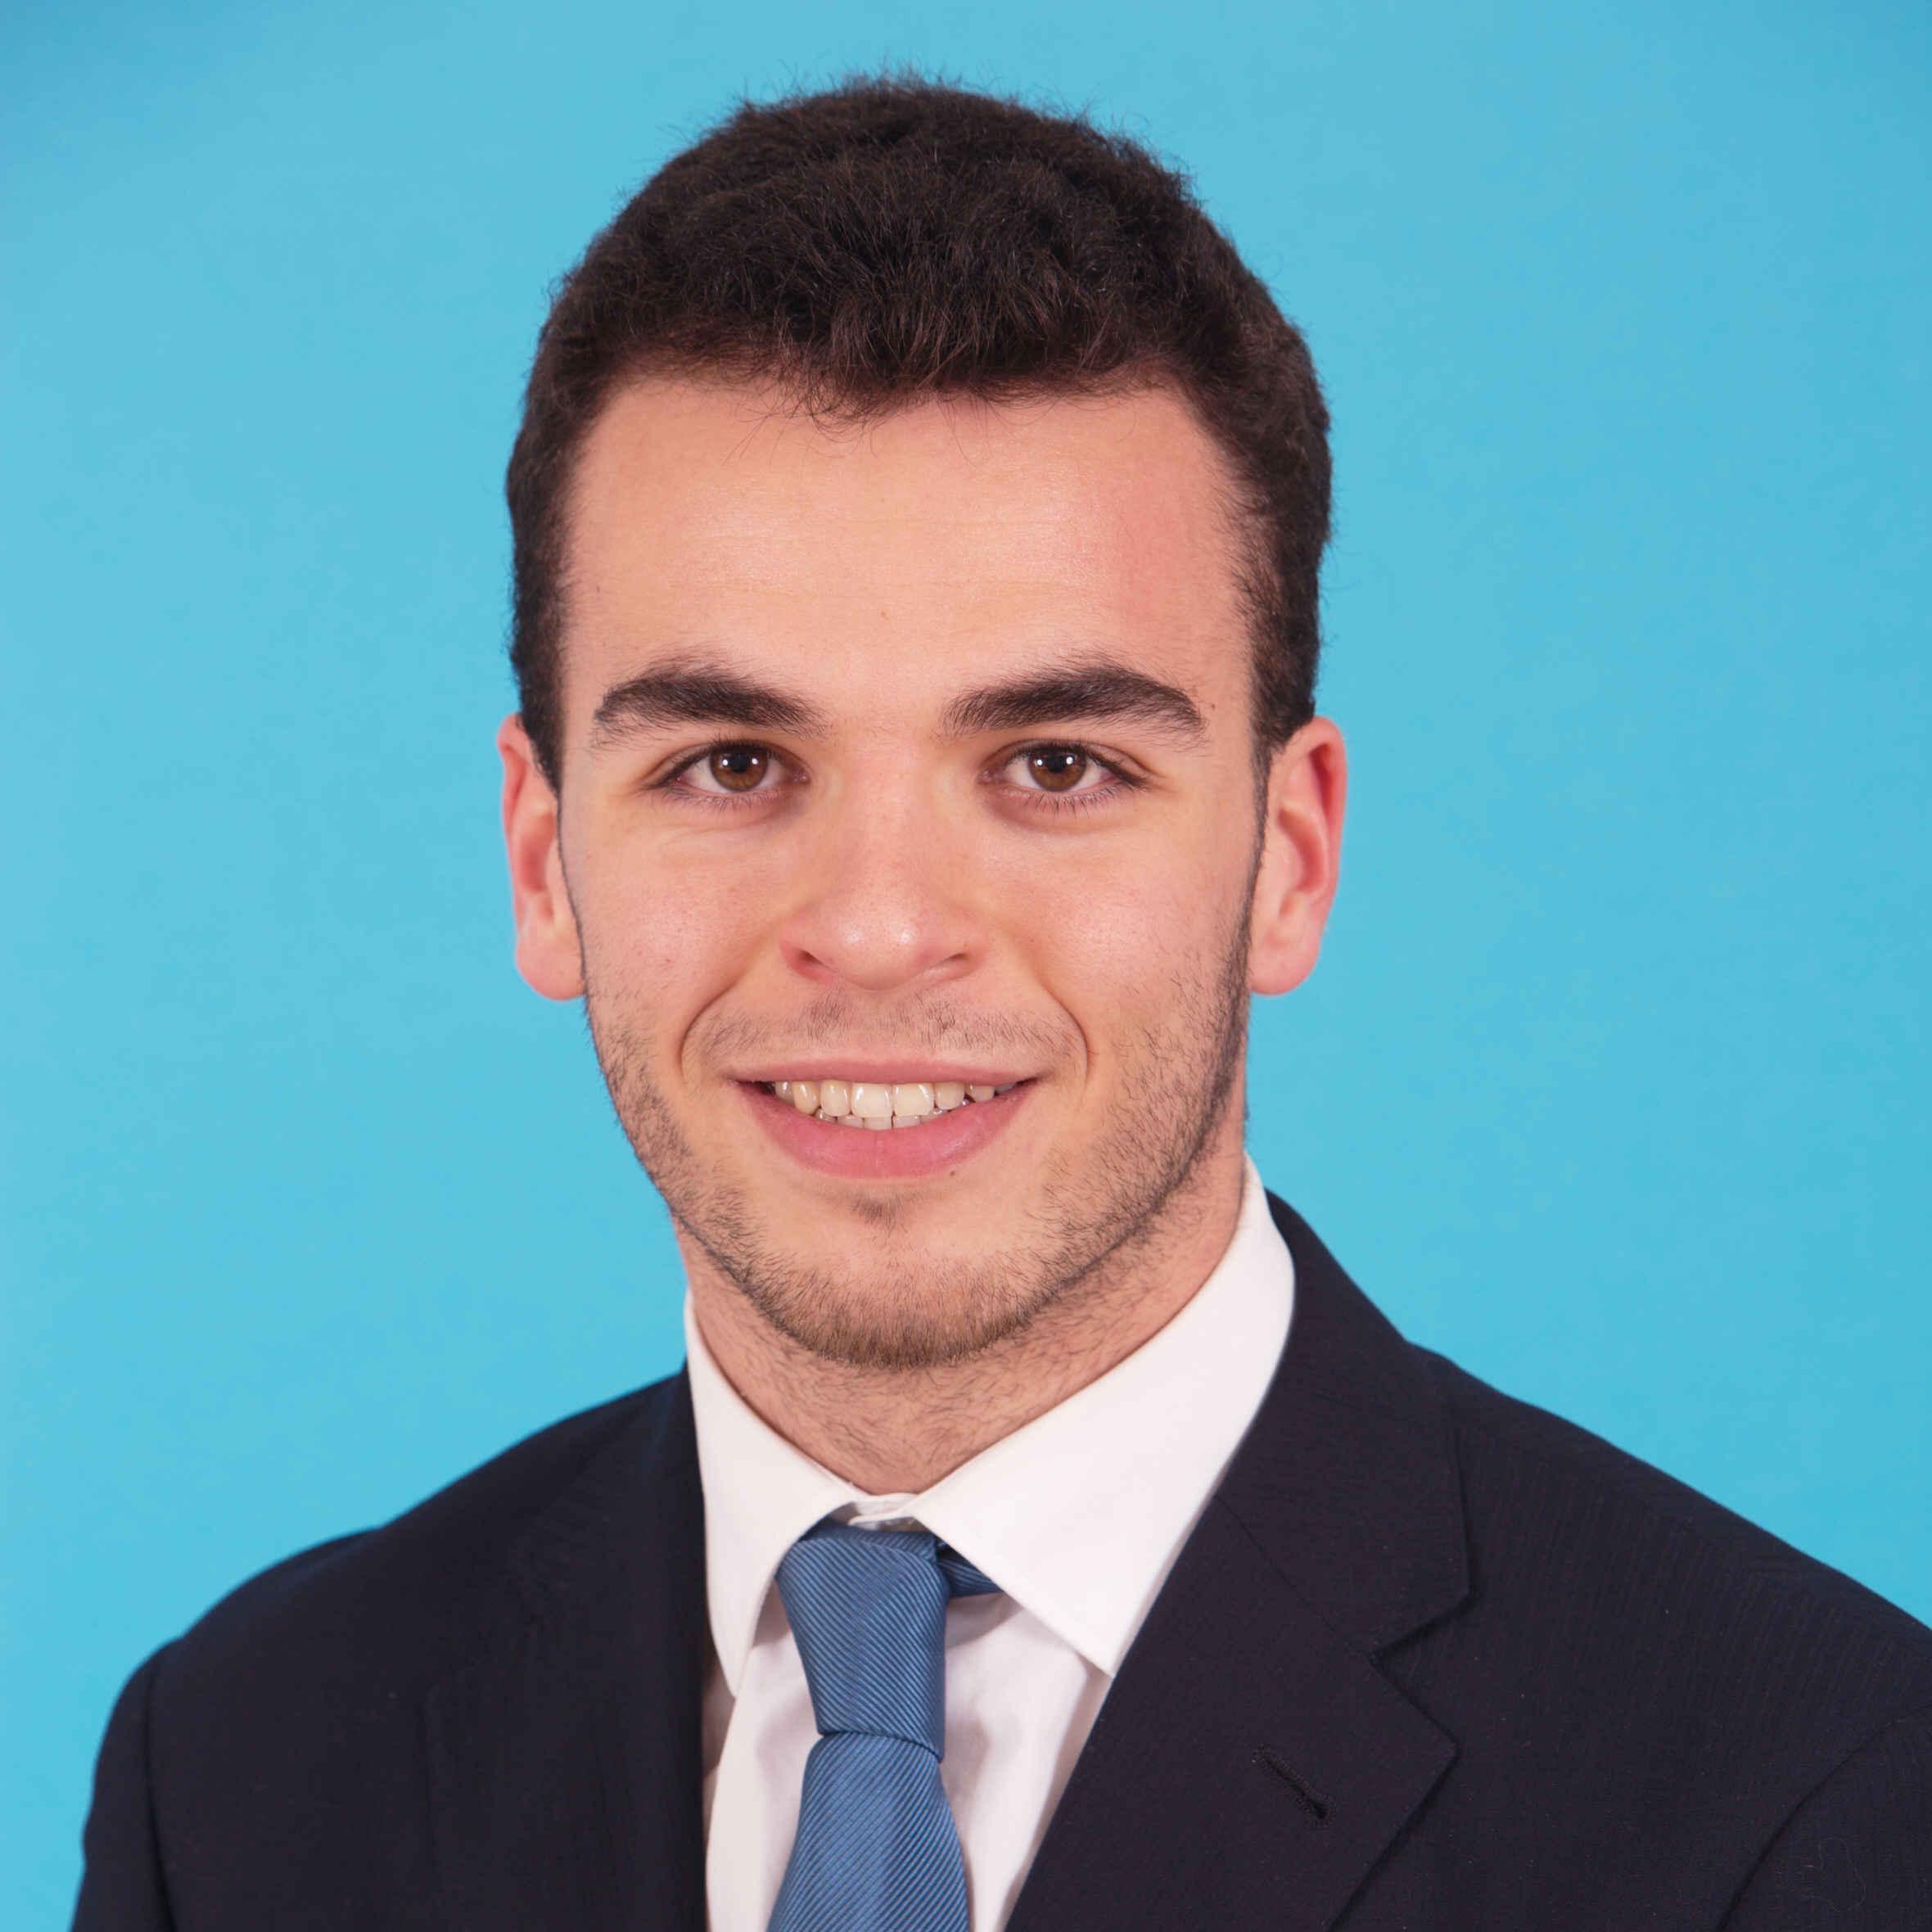 Pablo Abad - Su perfil. Votar, valora y comunicate